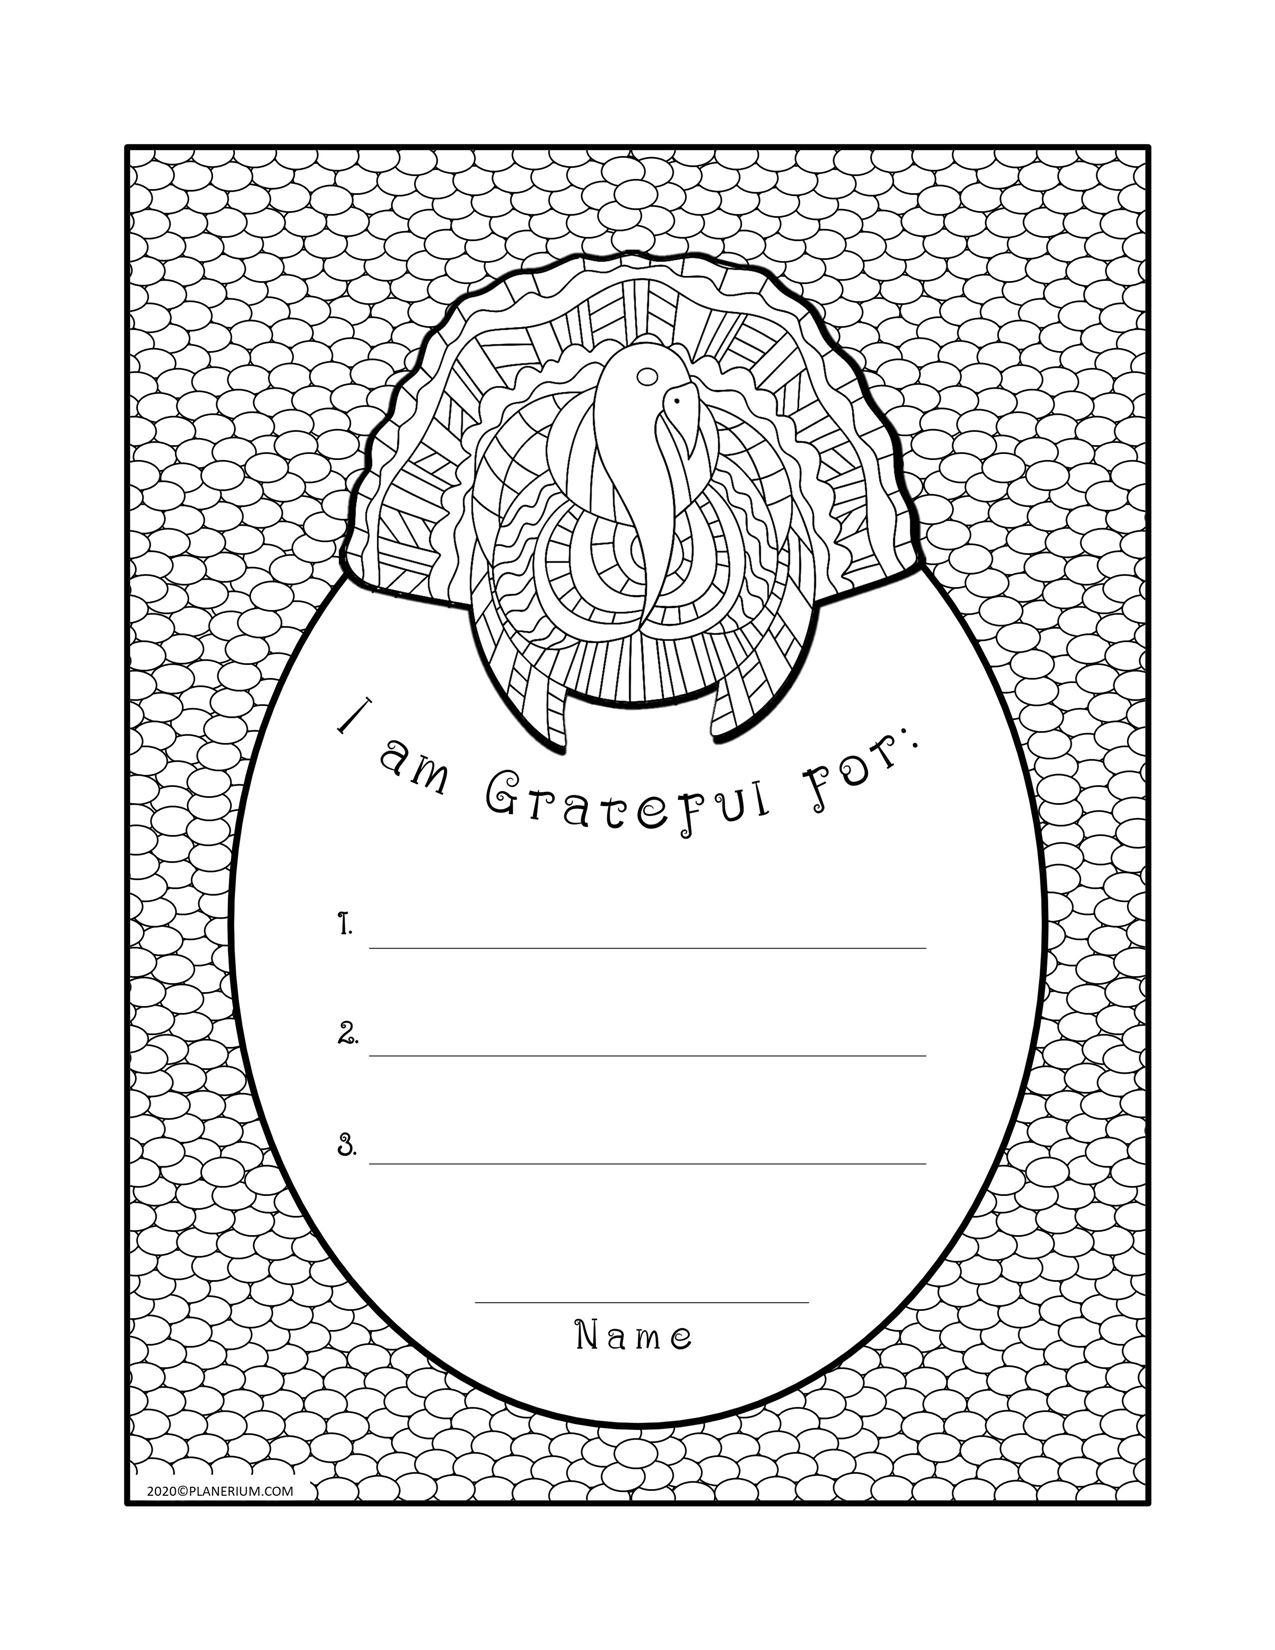 Thanksgiving Worksheets - Grateful List Card | Planerium